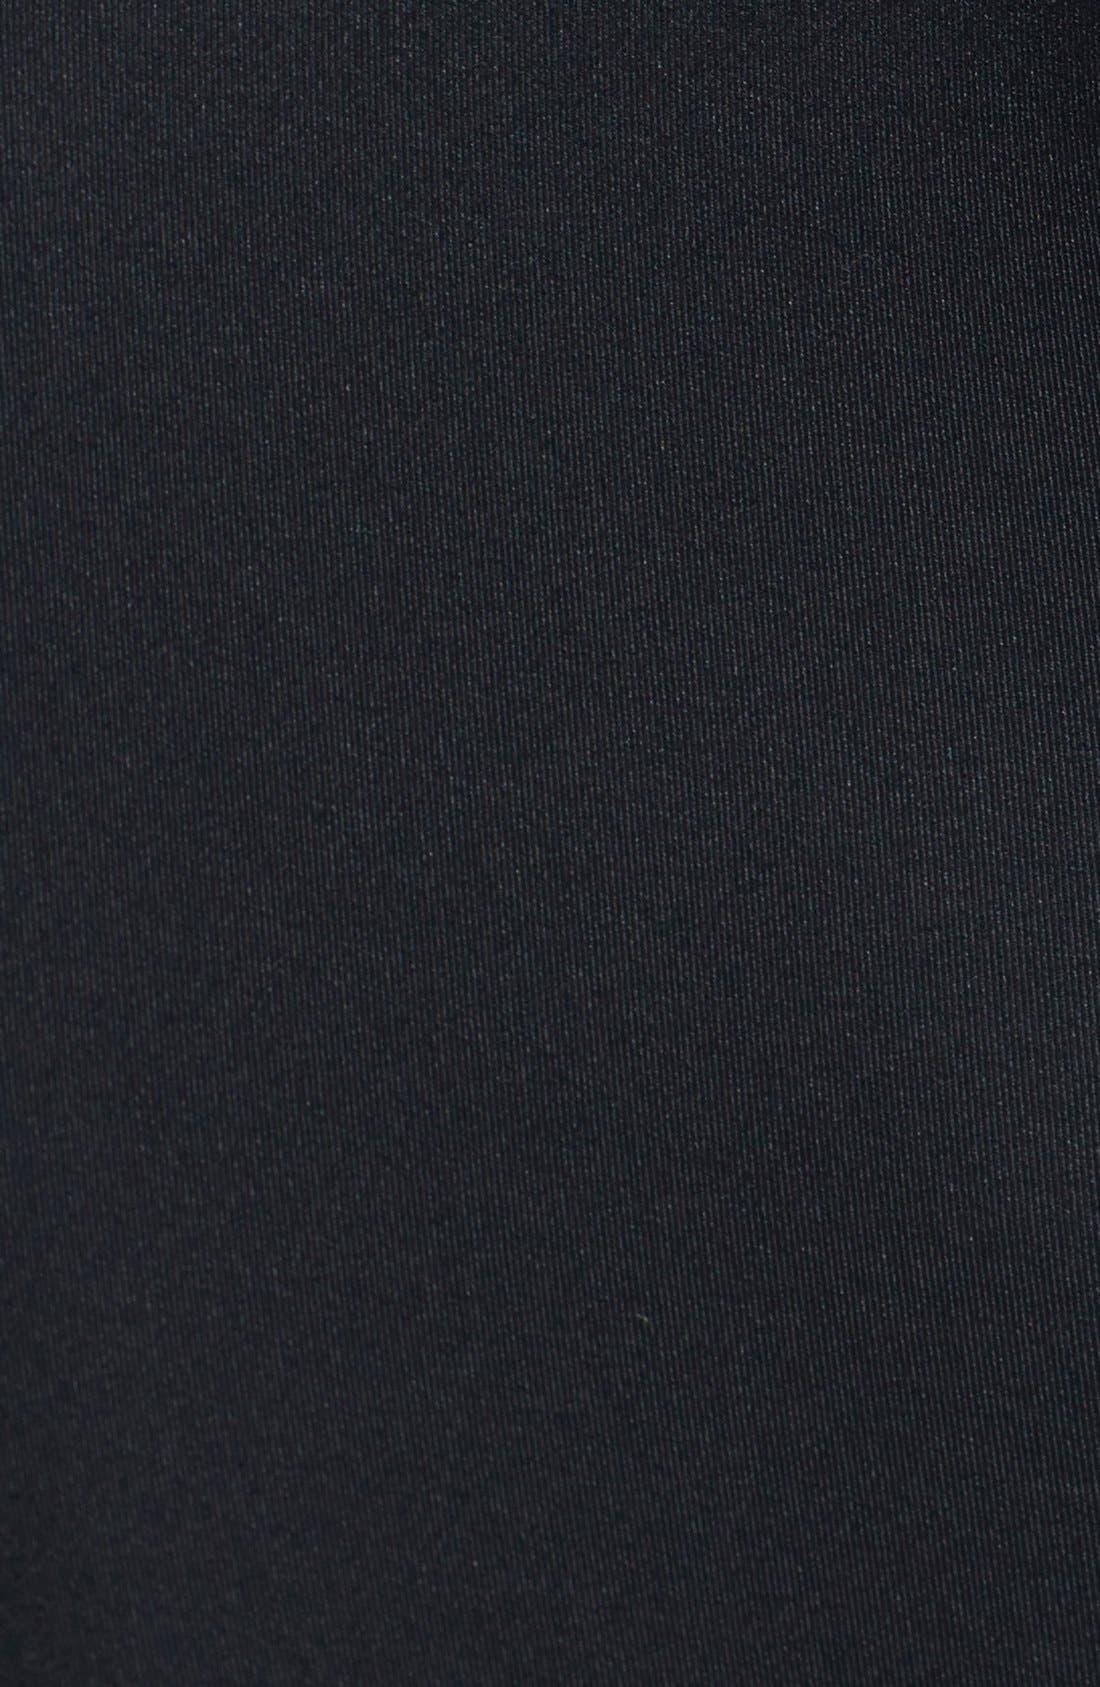 Alternate Image 3  - Leith Three Quarter Length Sleeve Bodysuit